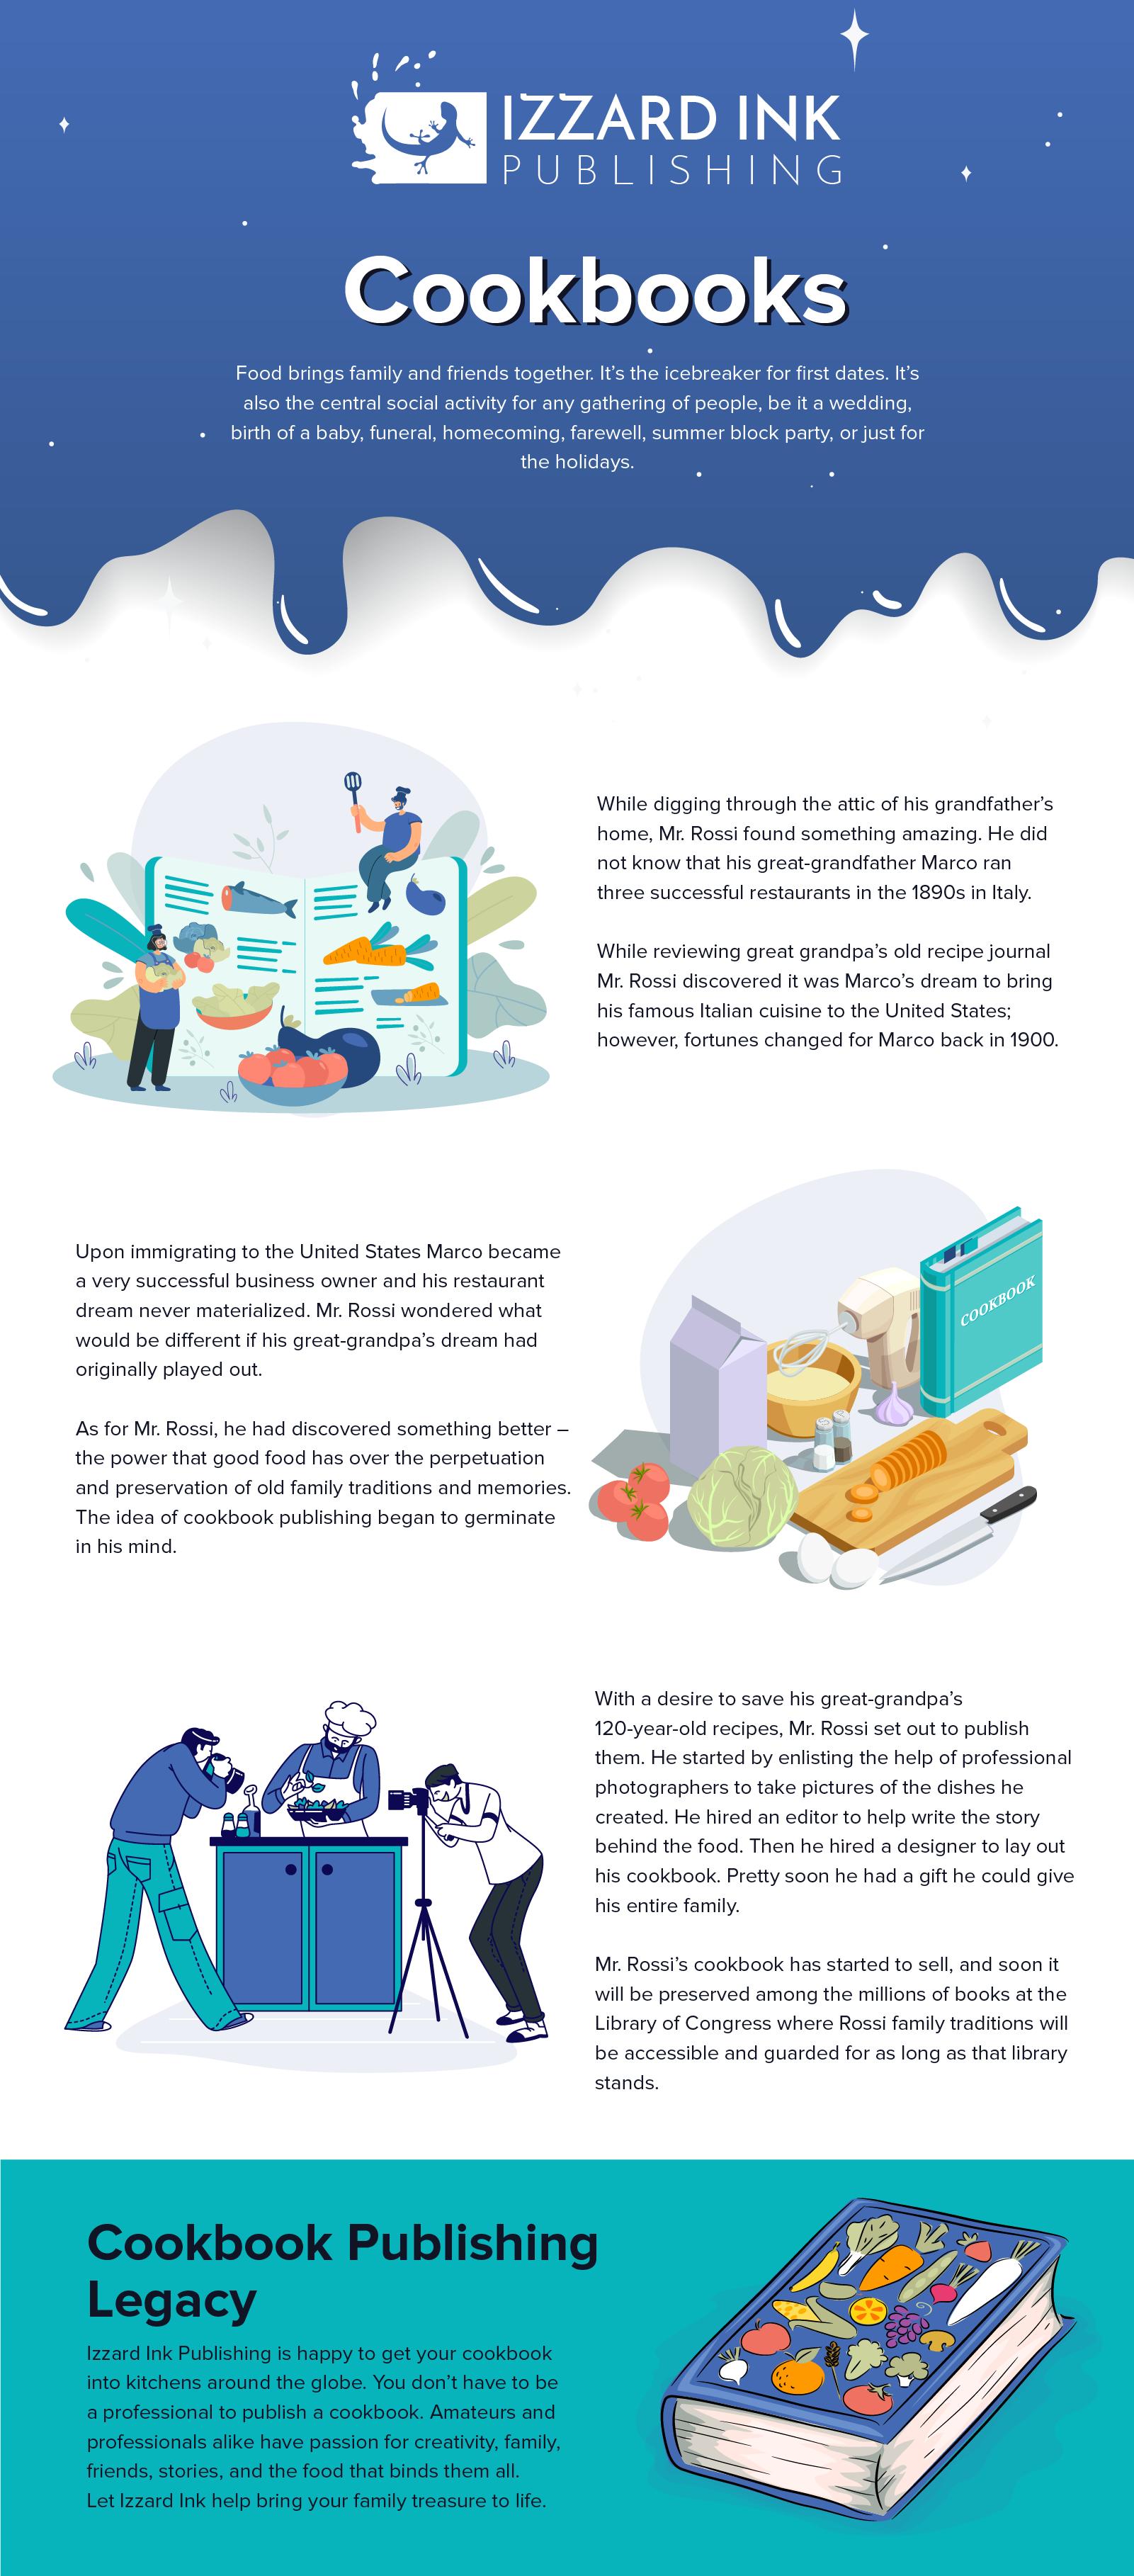 Cookbooks Infographic